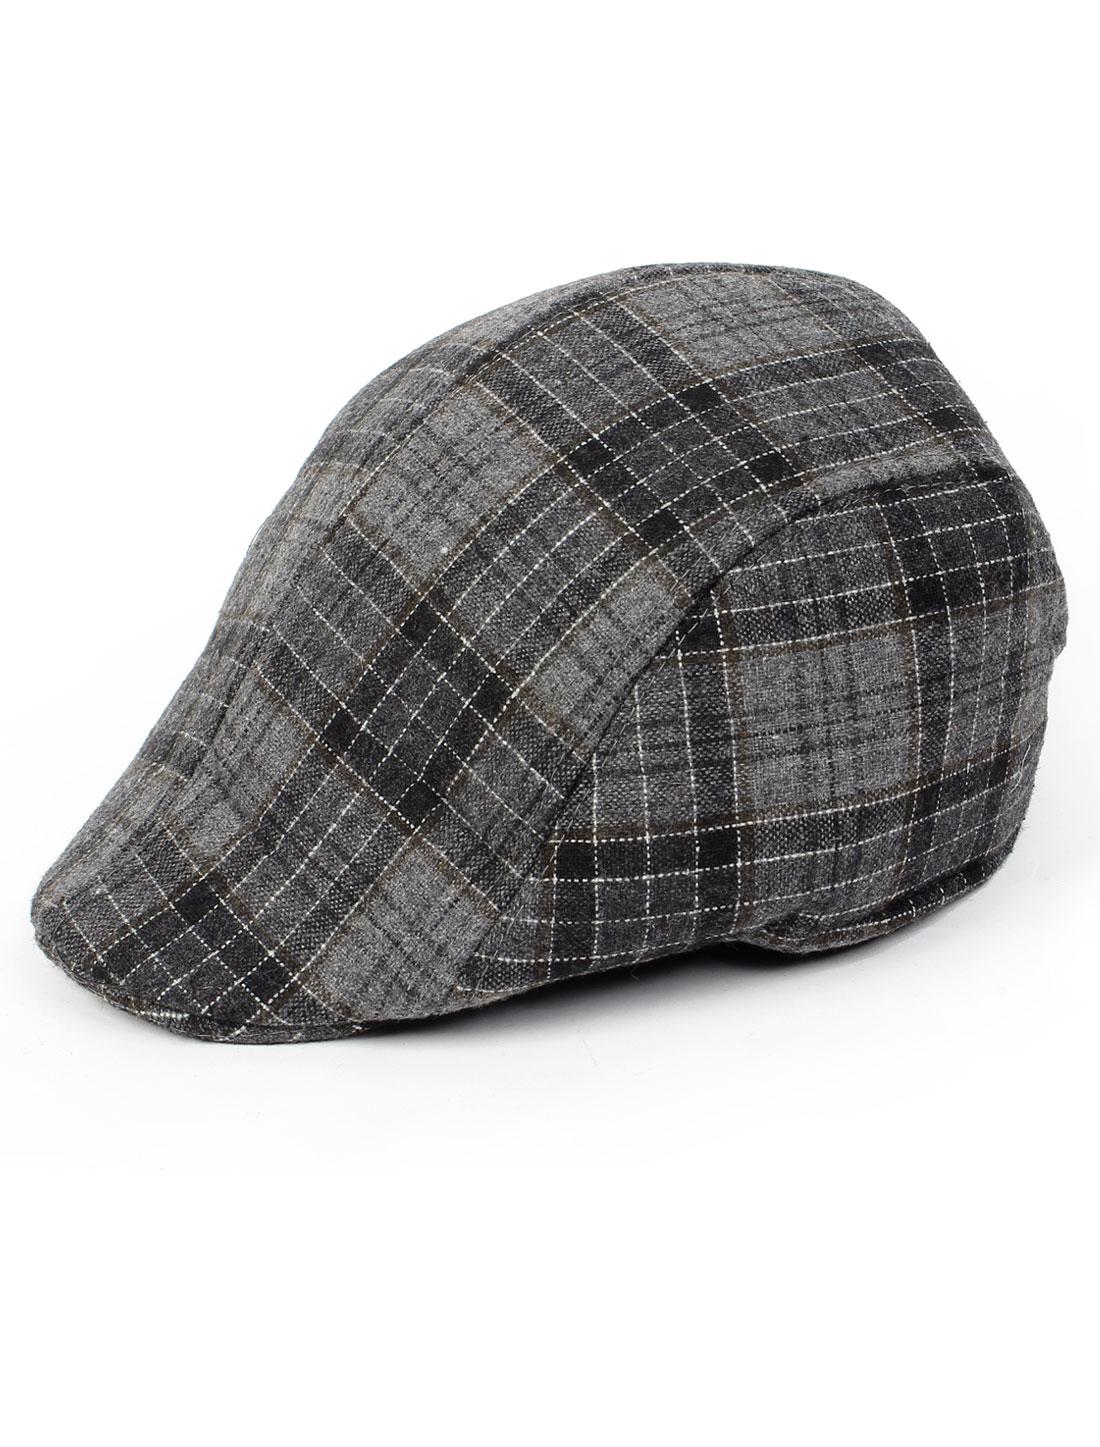 Man Black Gray Square Pattern Visor Cabbie Hat Ascot Flat Cap